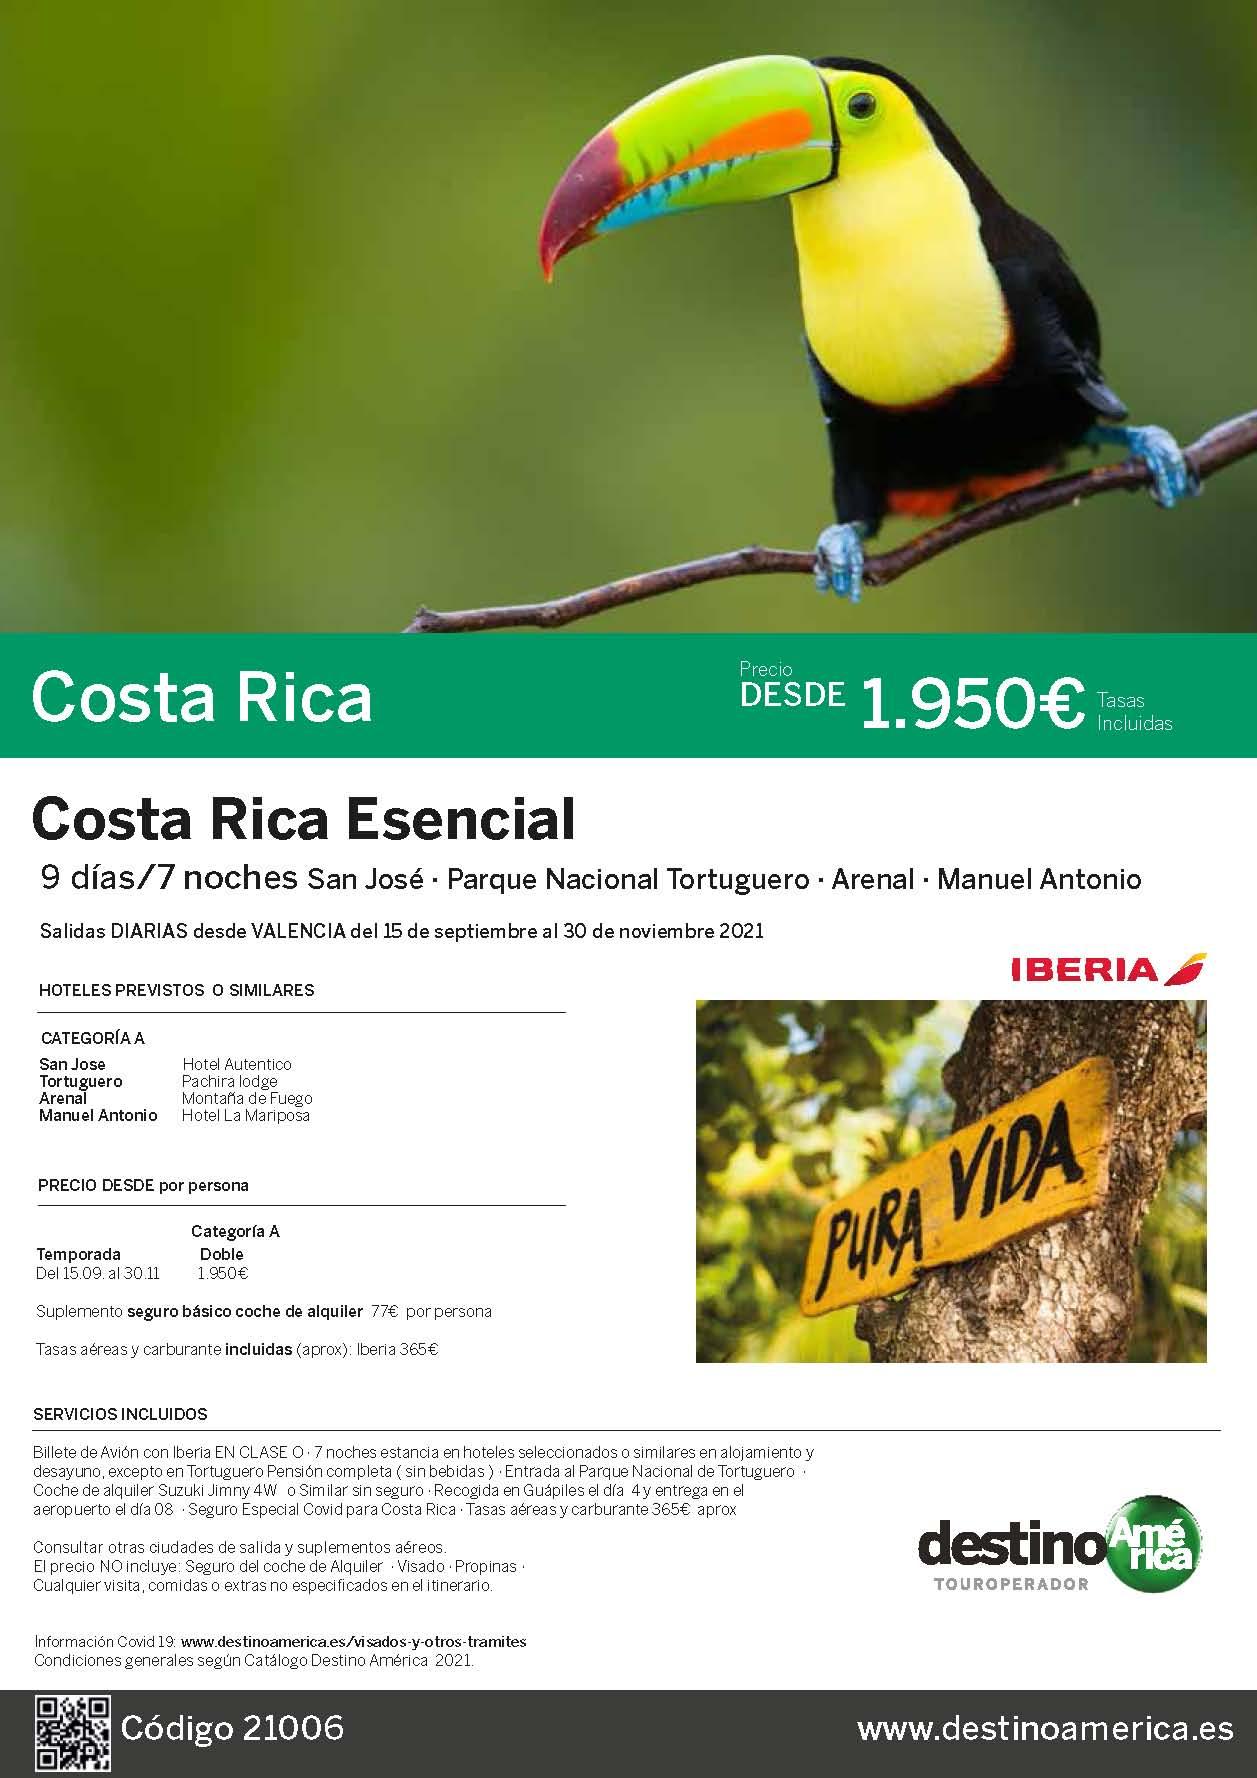 Oferta Destino America Costa Rica Esencial Octubre a Noviembre 2021 salida desde Valencia